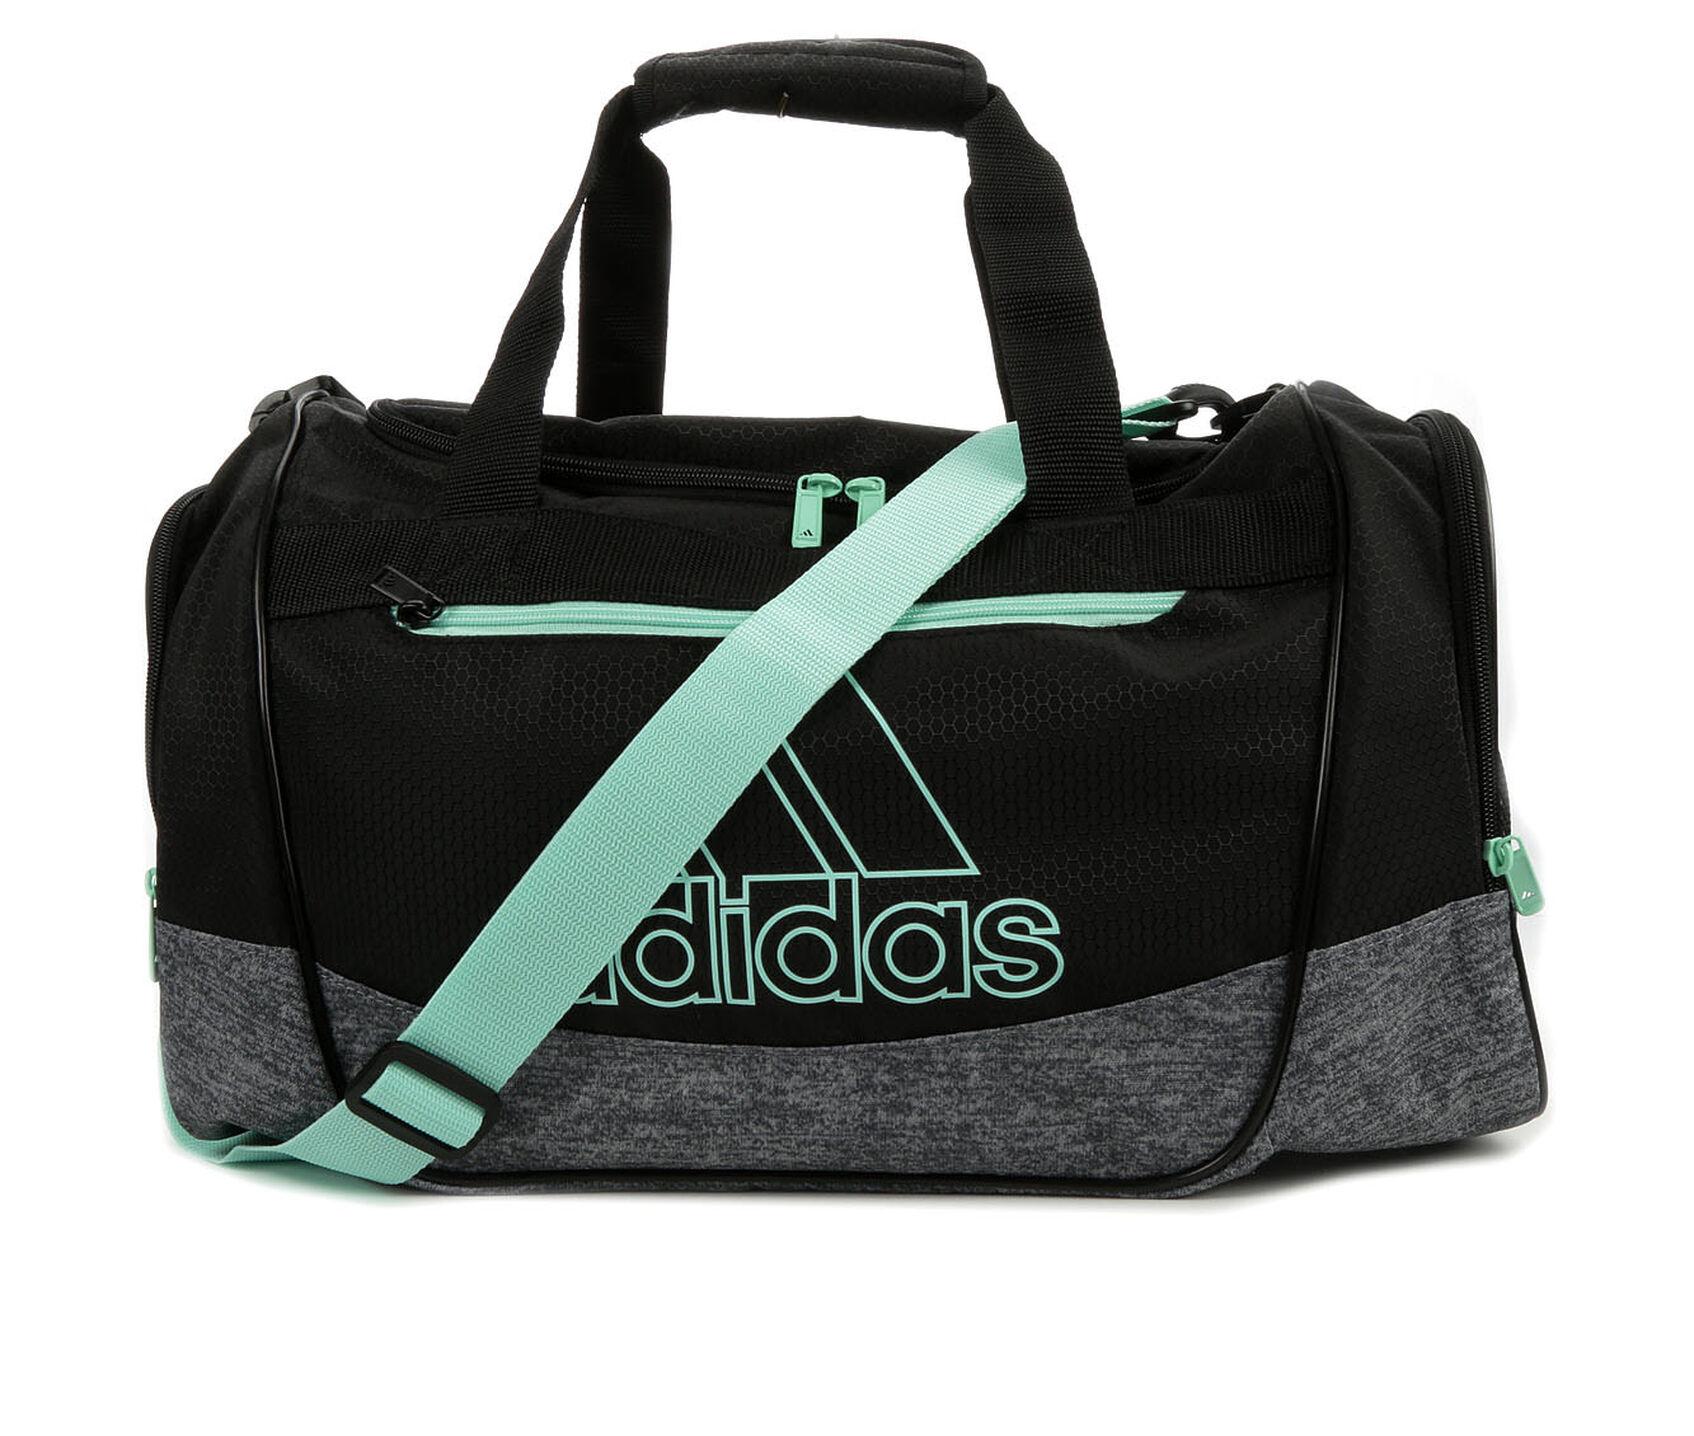 Adidas Defender III Small Duffel Bag. Carousel Controls e326695bcd